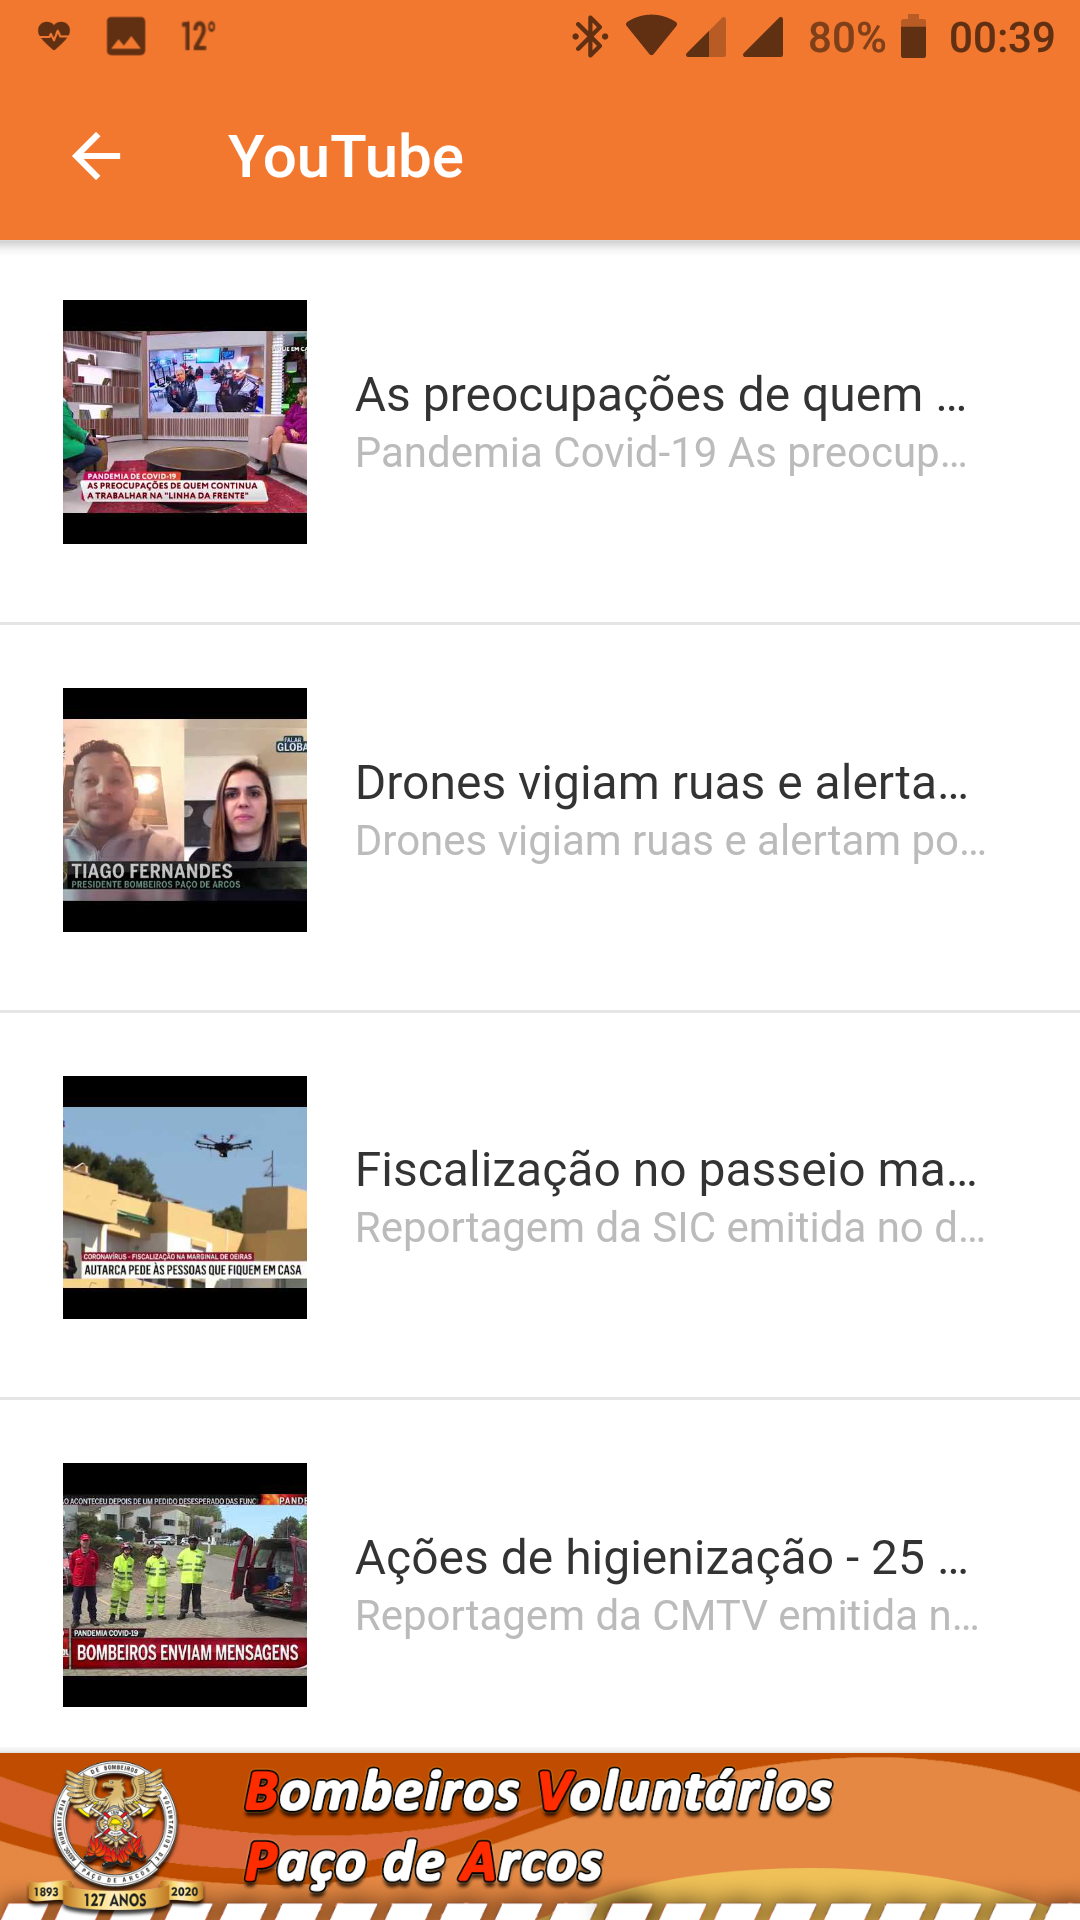 app_bvpacodearcos_20201030 (18)